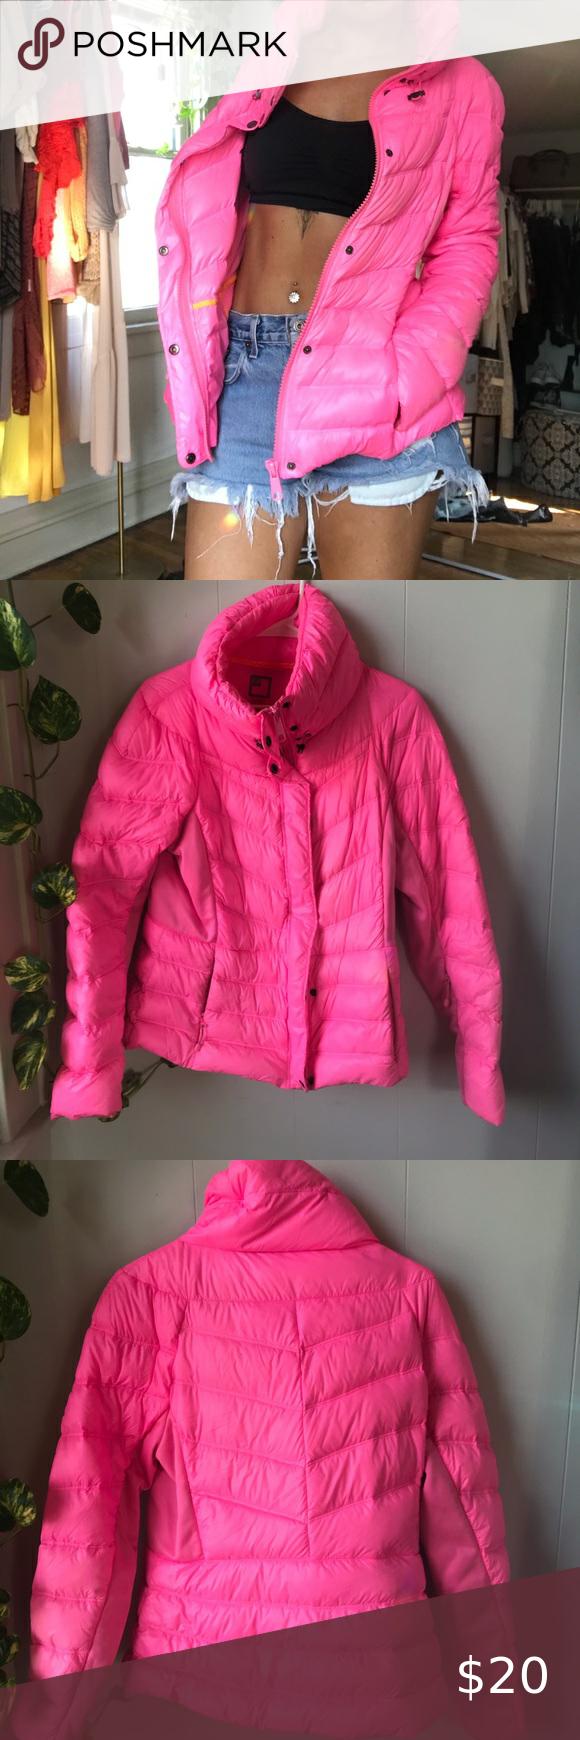 Jcp Large Hot Pink Puffer Jacket Lightweight Pink Puffer Jacket Clothes Design Hot Pink [ 1740 x 580 Pixel ]